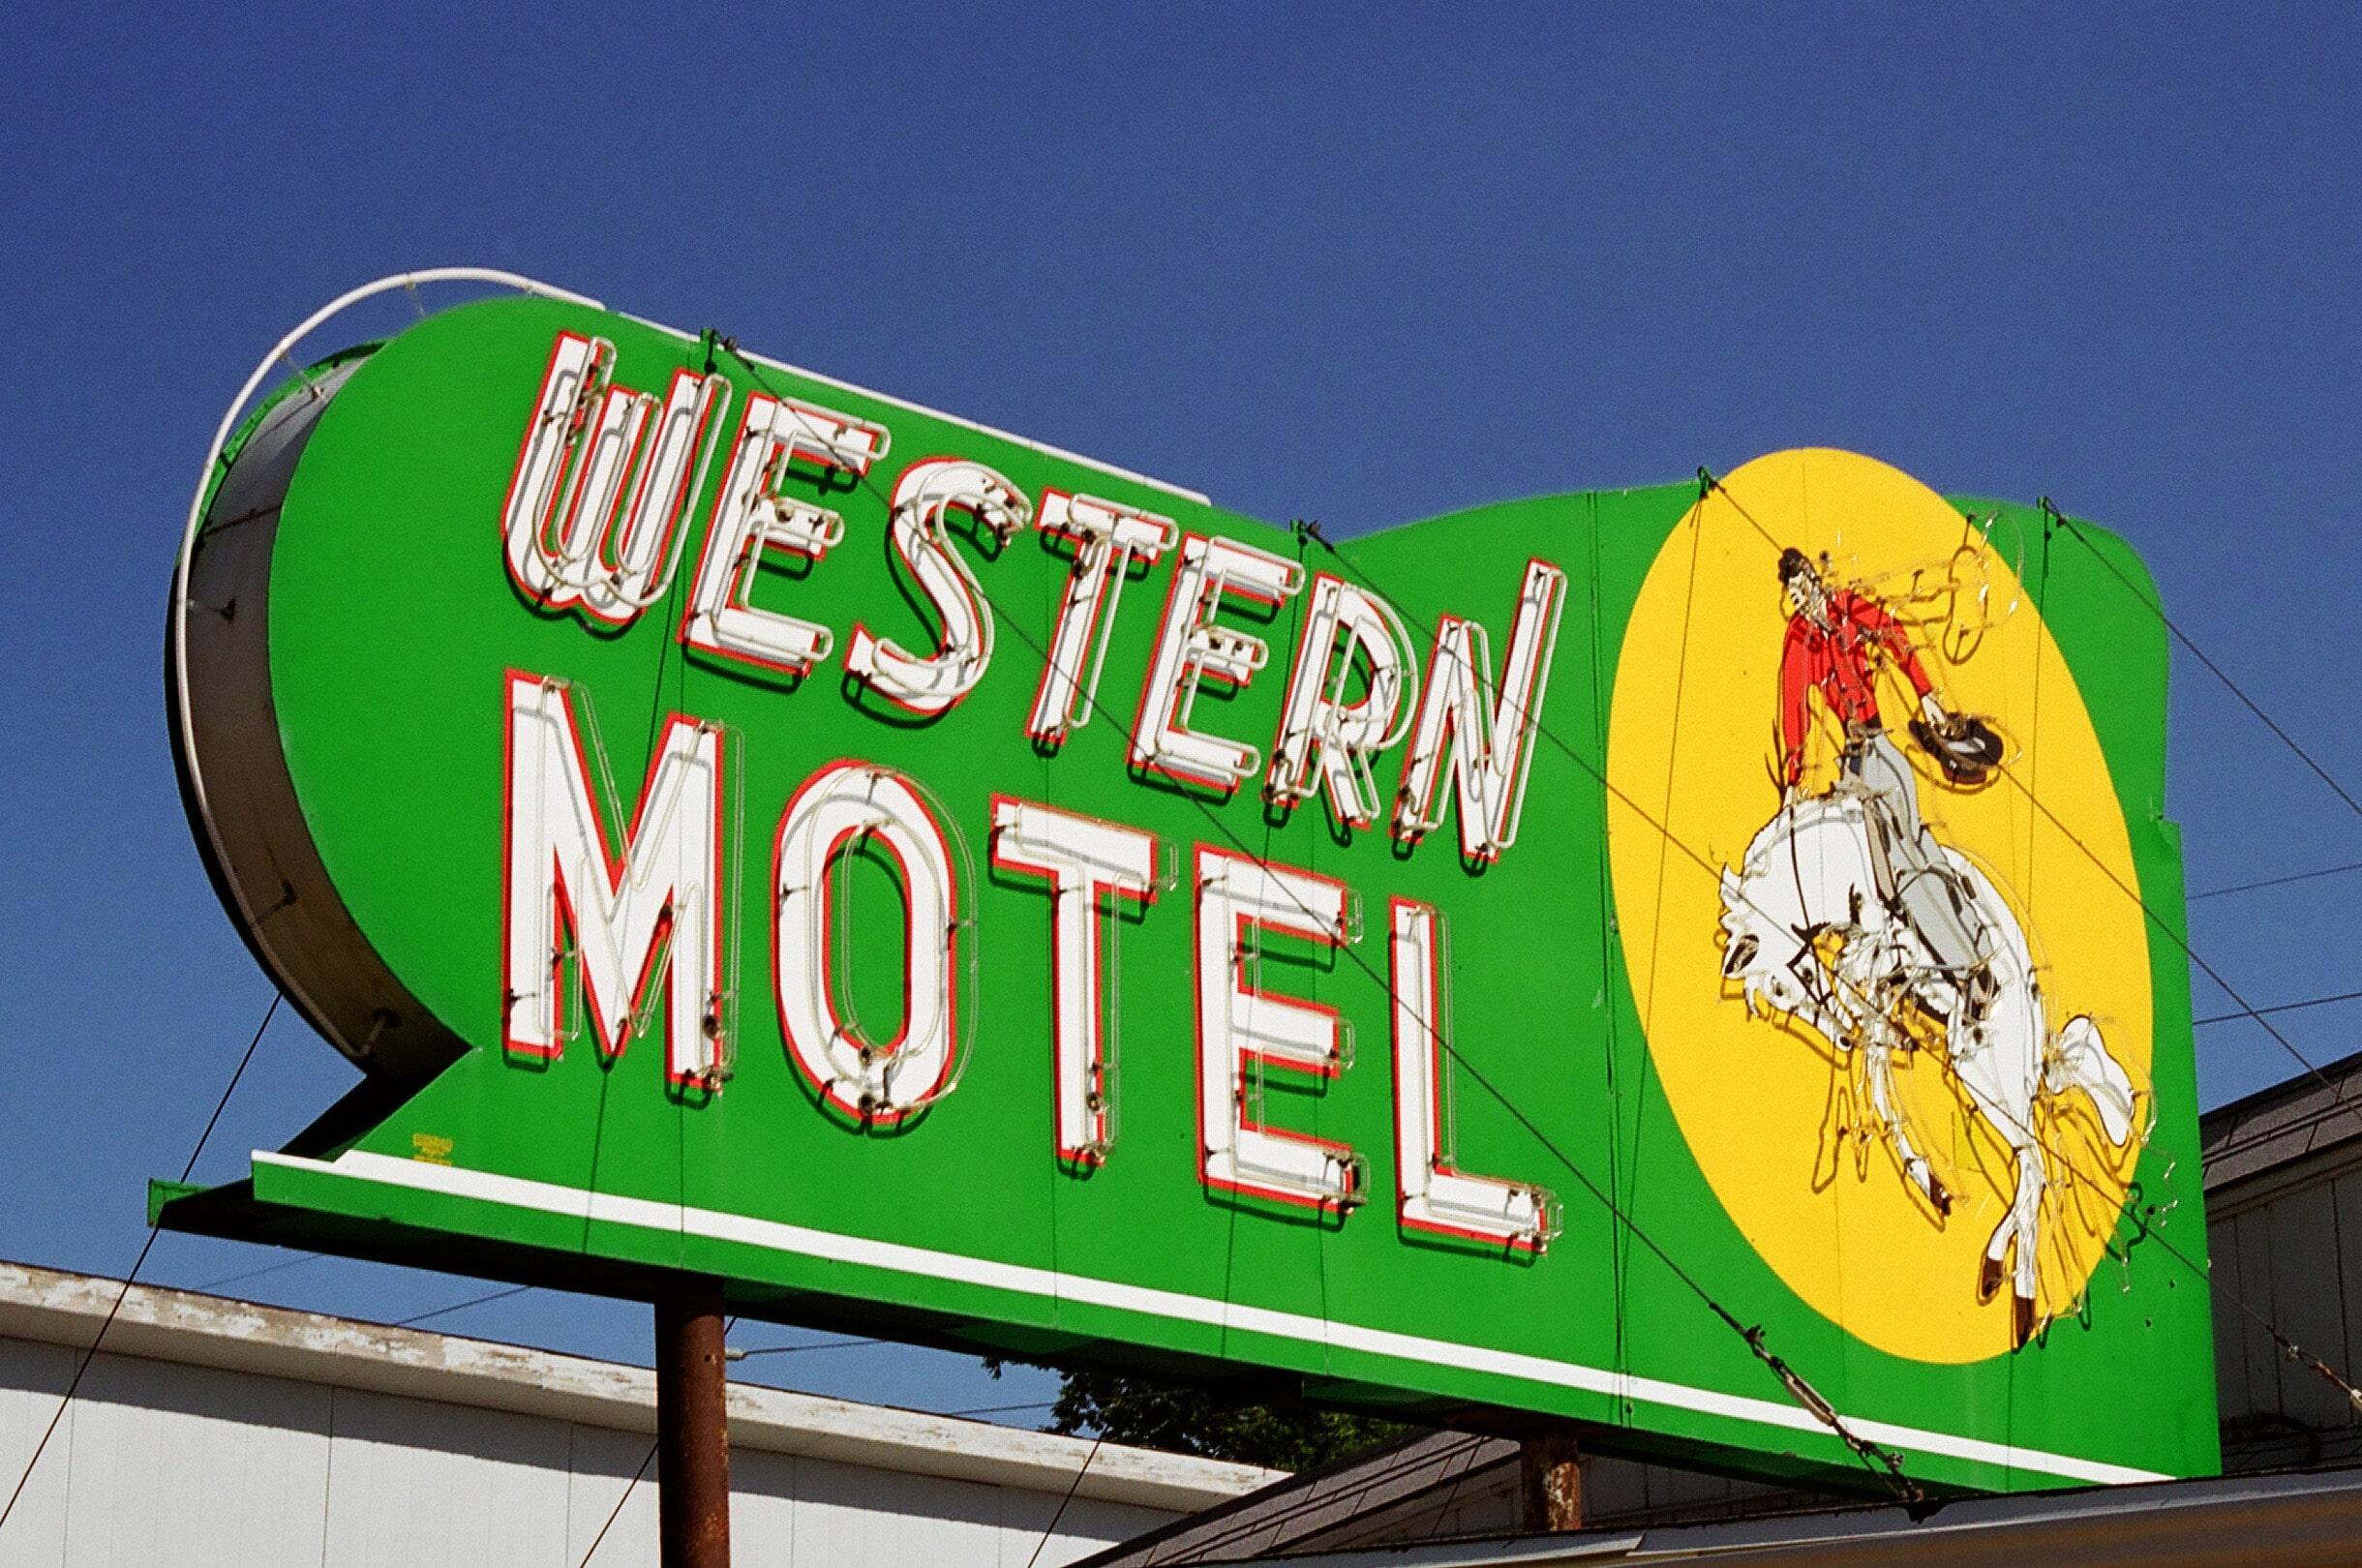 04-Western-Motel.jpg